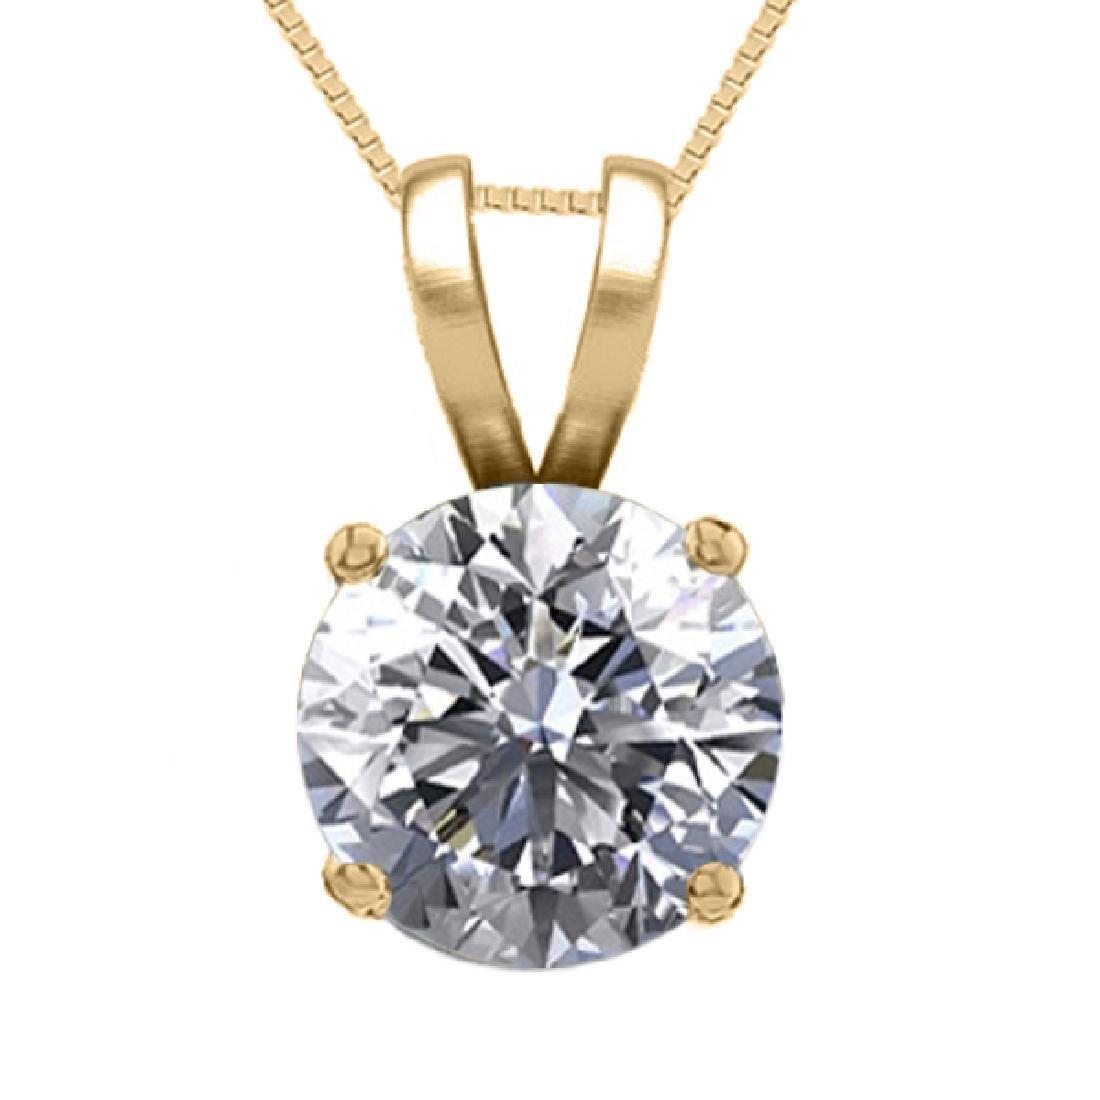 14K Yellow Gold Jewelry 0.56 ct Natural Diamond